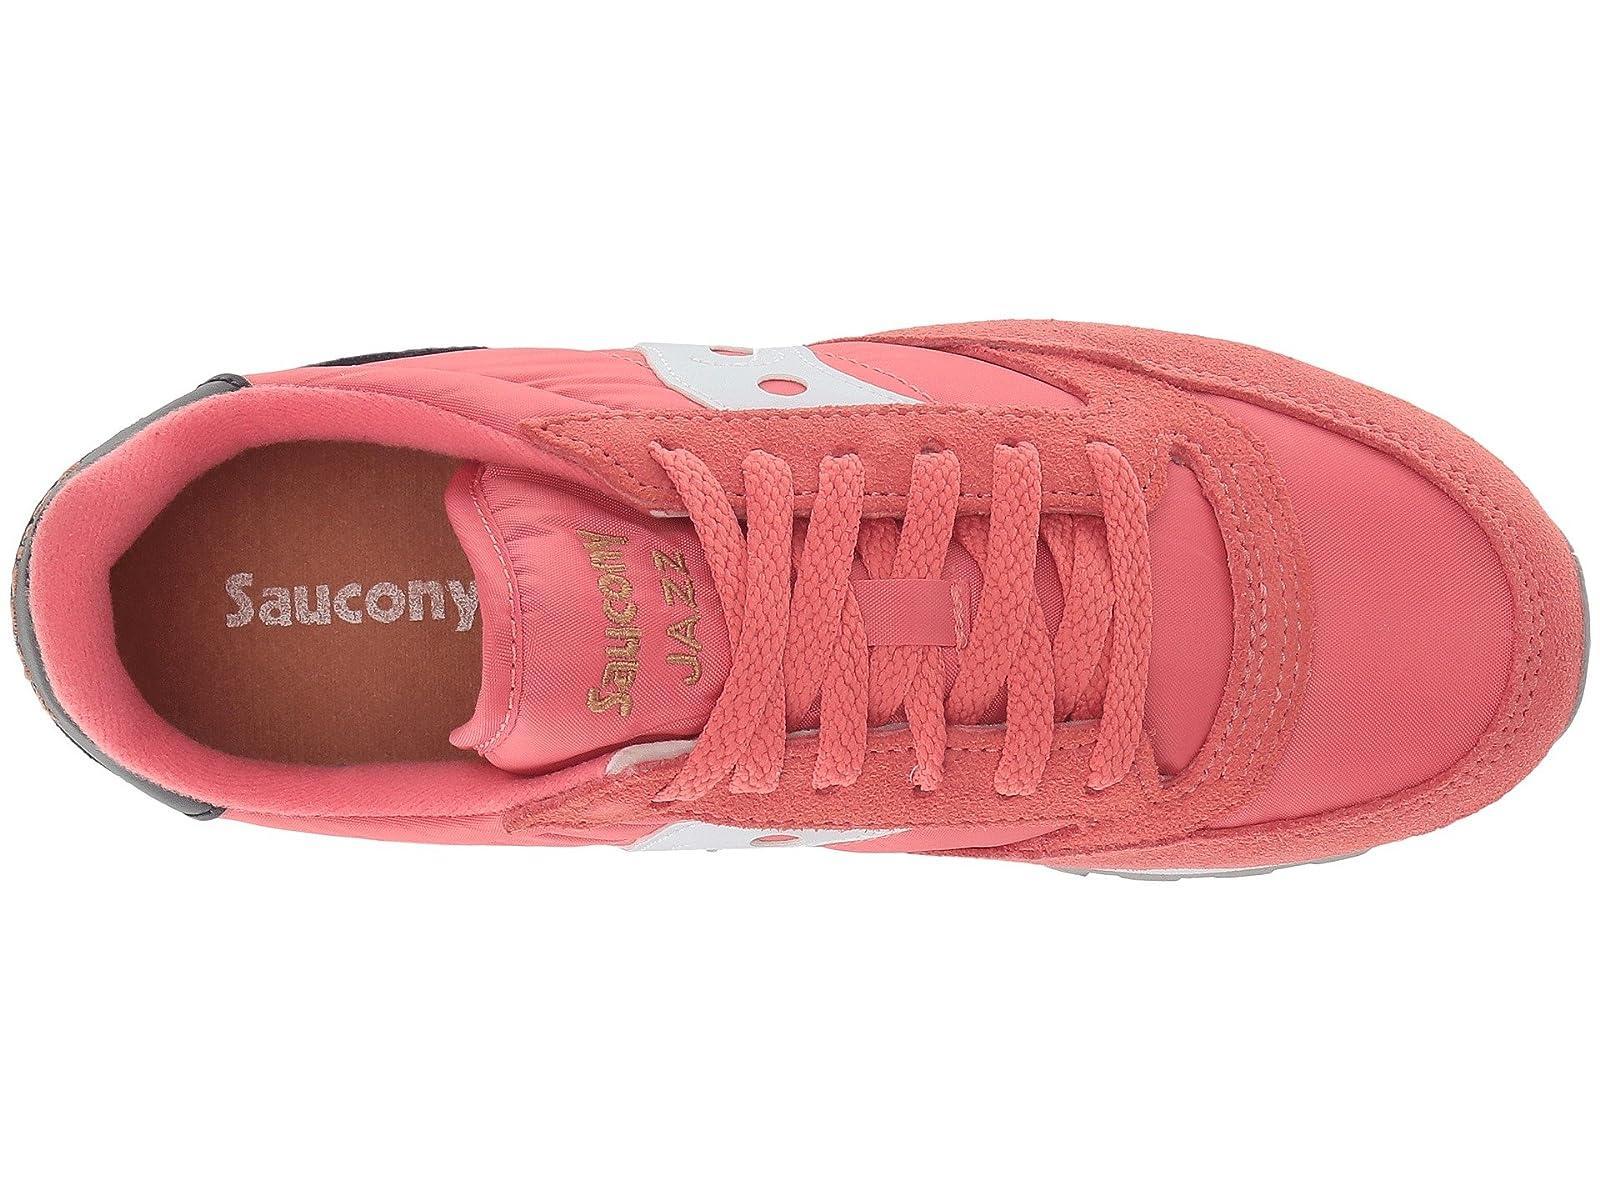 Woman-039-s-Sneakers-amp-Athletic-Shoes-Saucony-Originals-Jazz-Original thumbnail 24